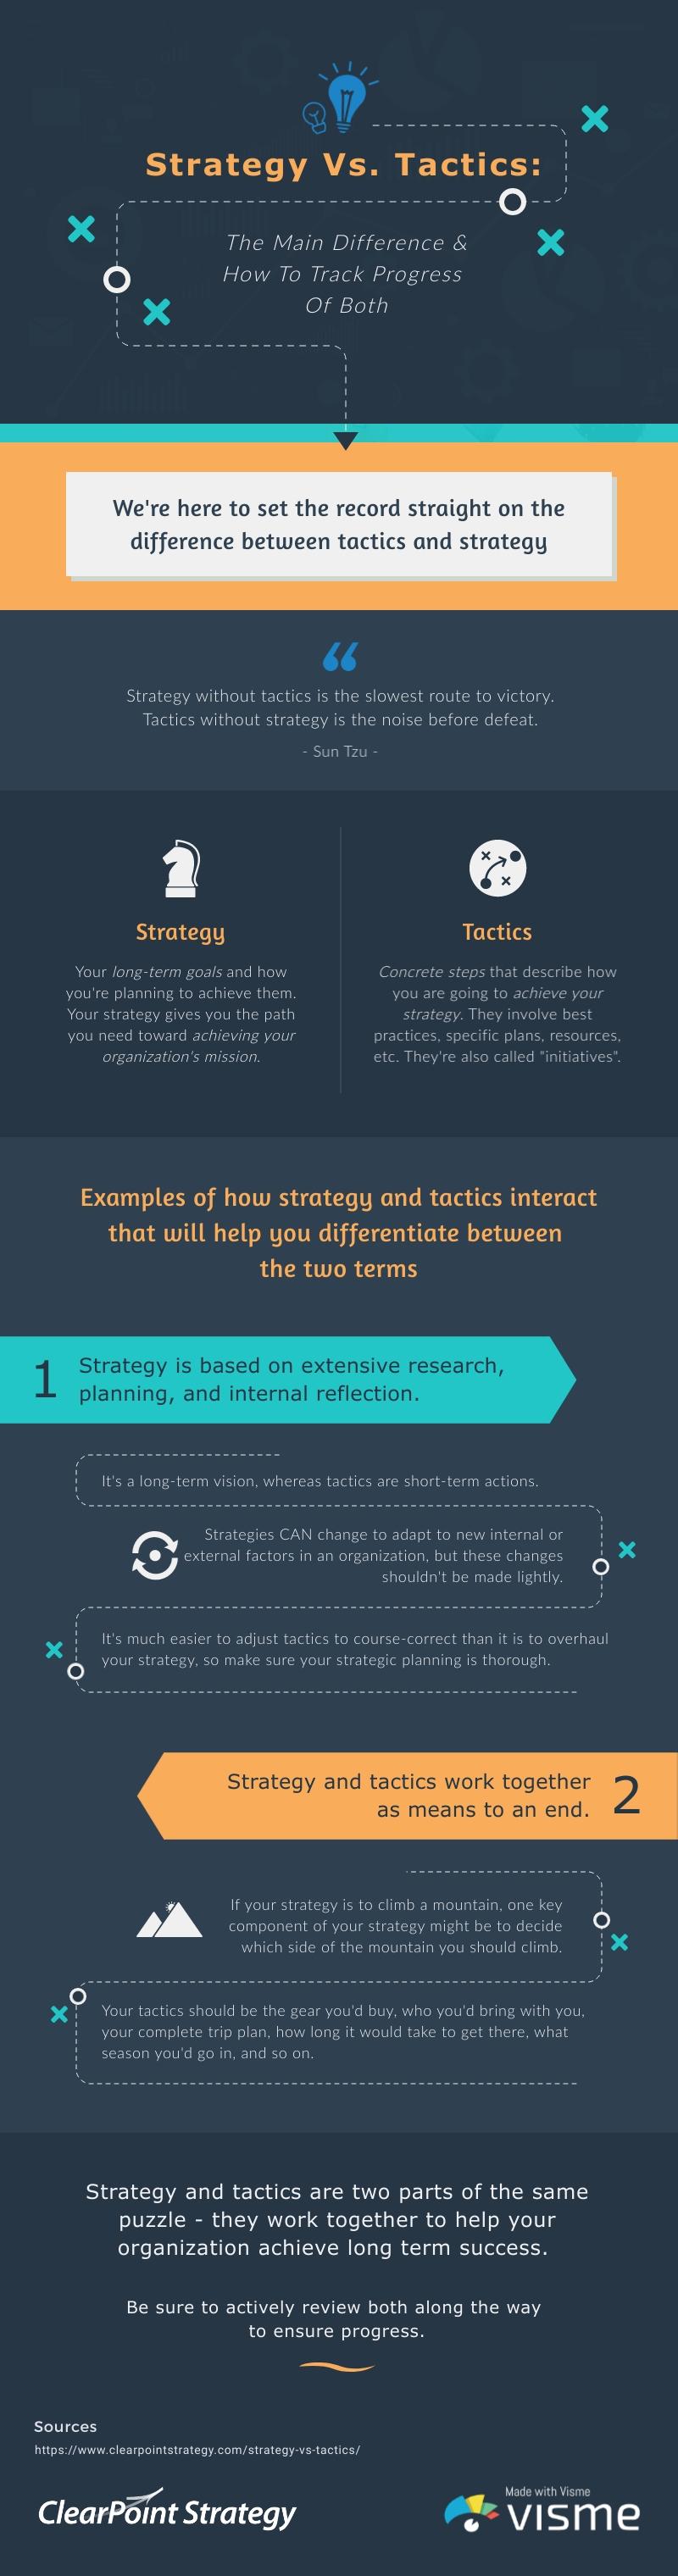 Strategy vs. Tactics Comparison - Infographic Template